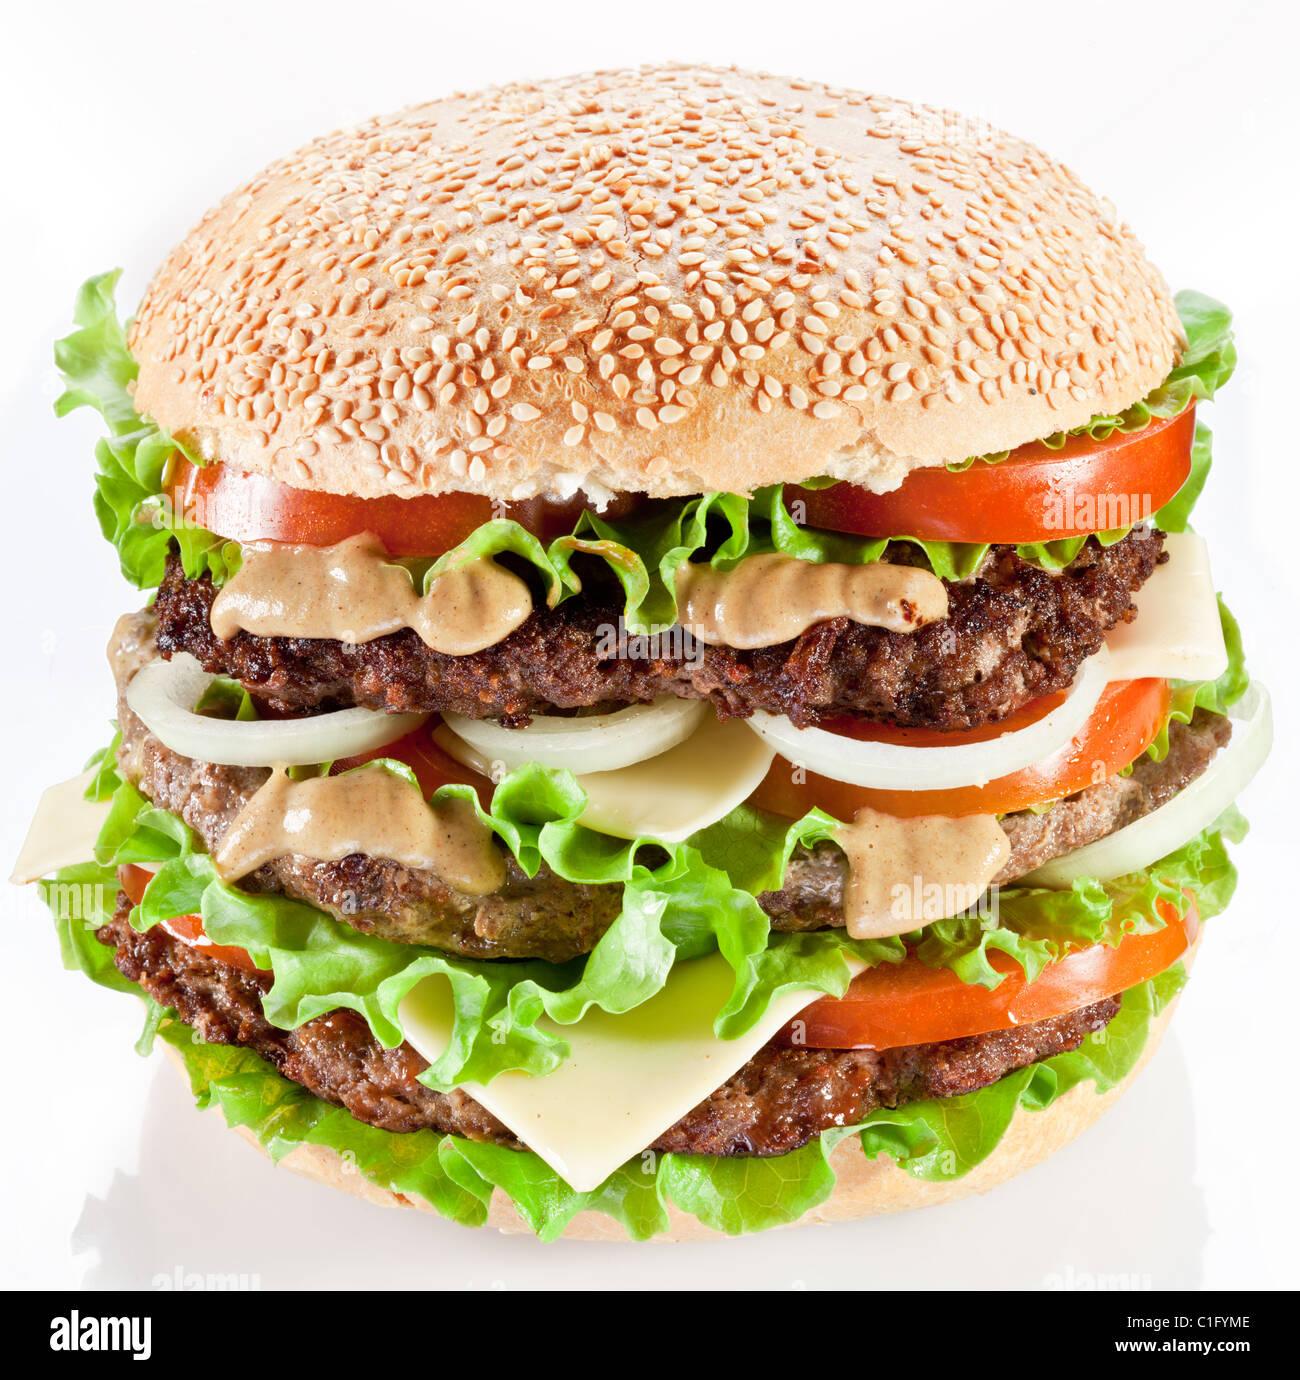 Gustoso hamburger su sfondo bianco. Immagini Stock